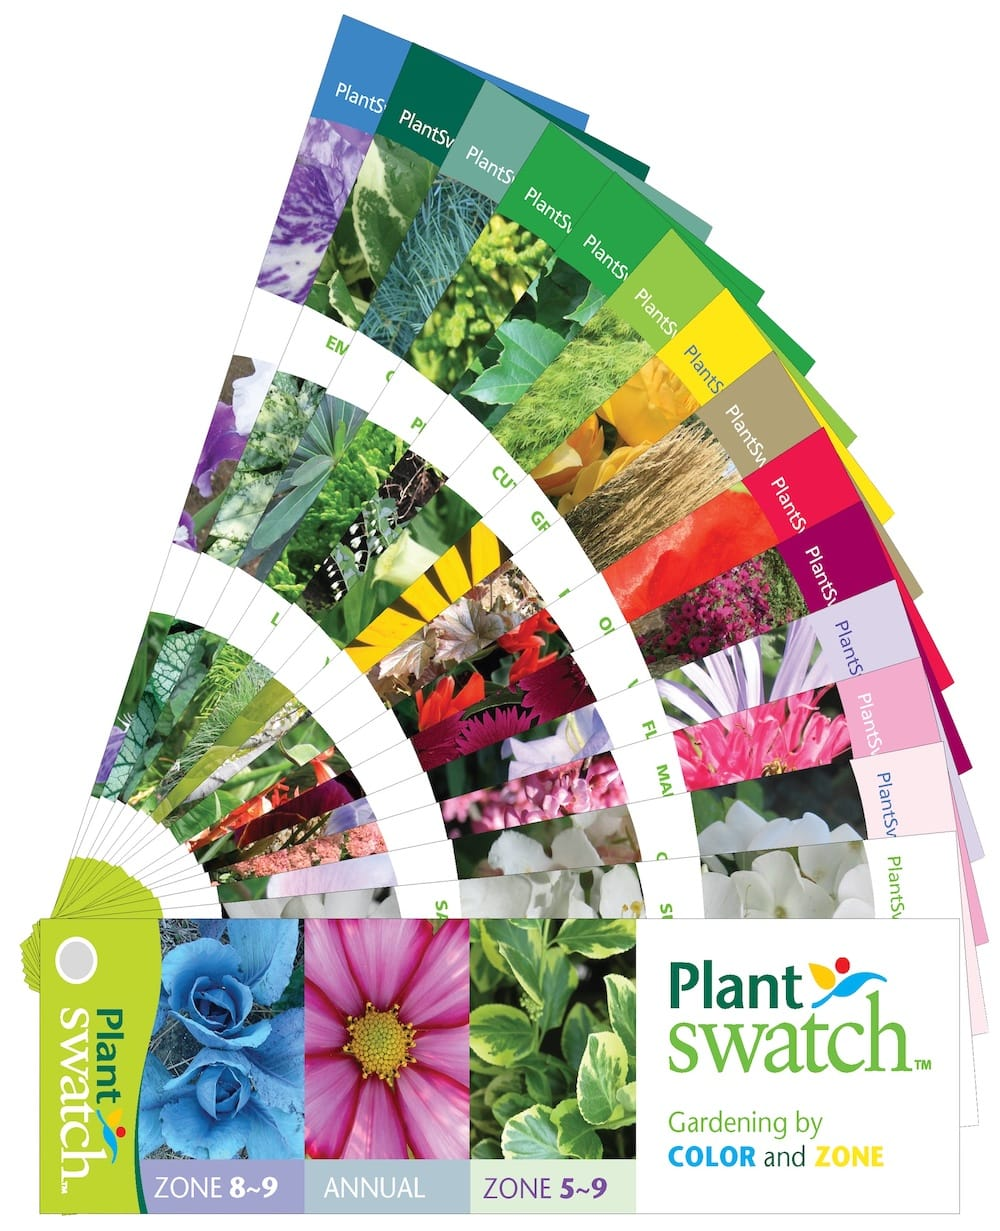 PlantSwatch